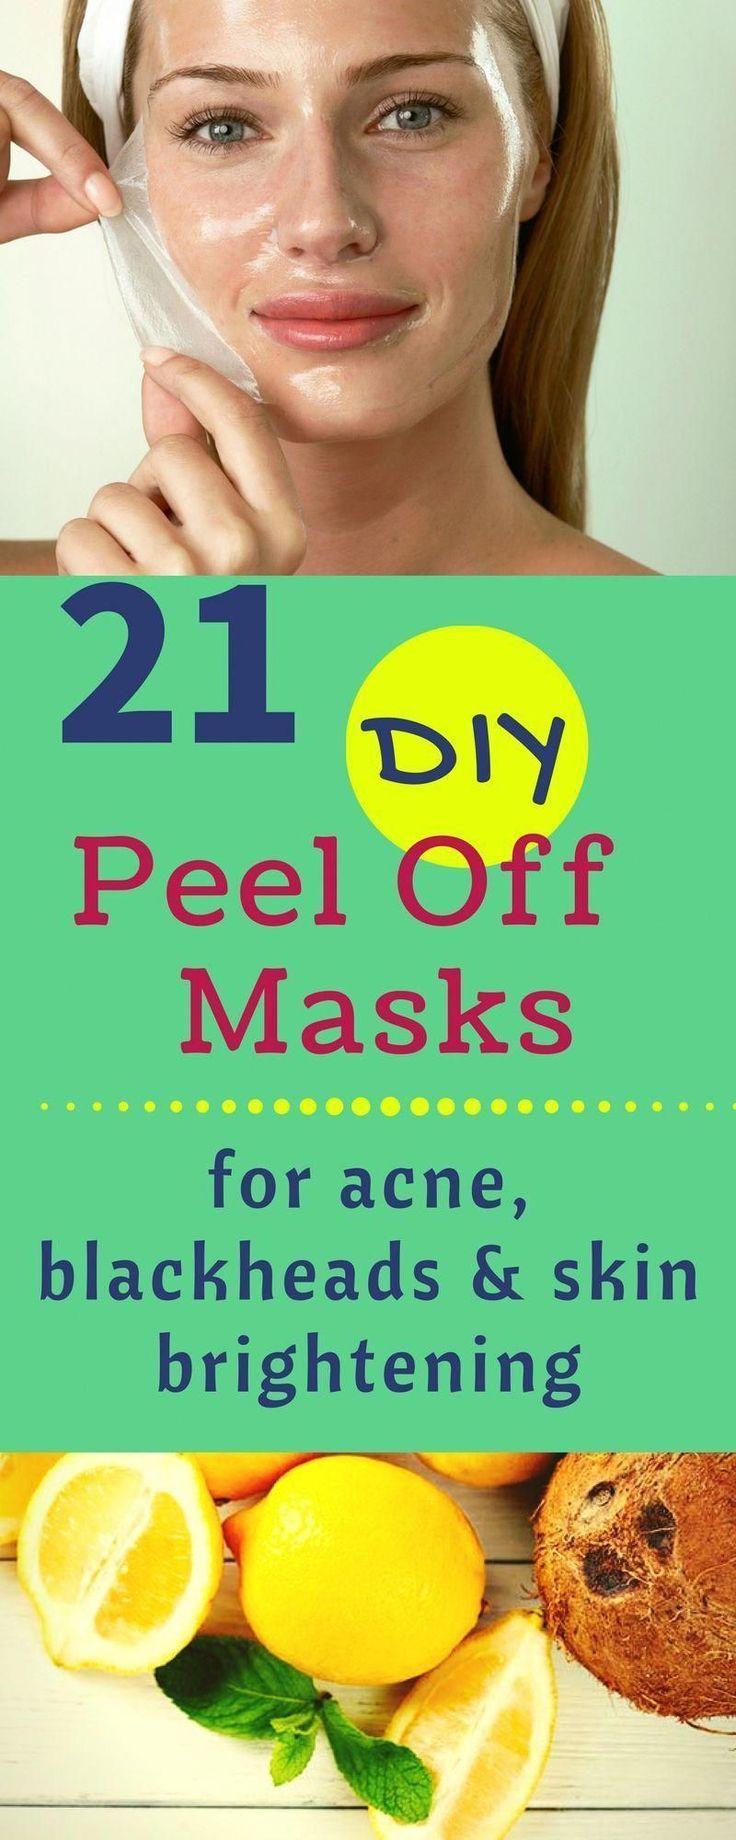 blackhead extraction mask diy